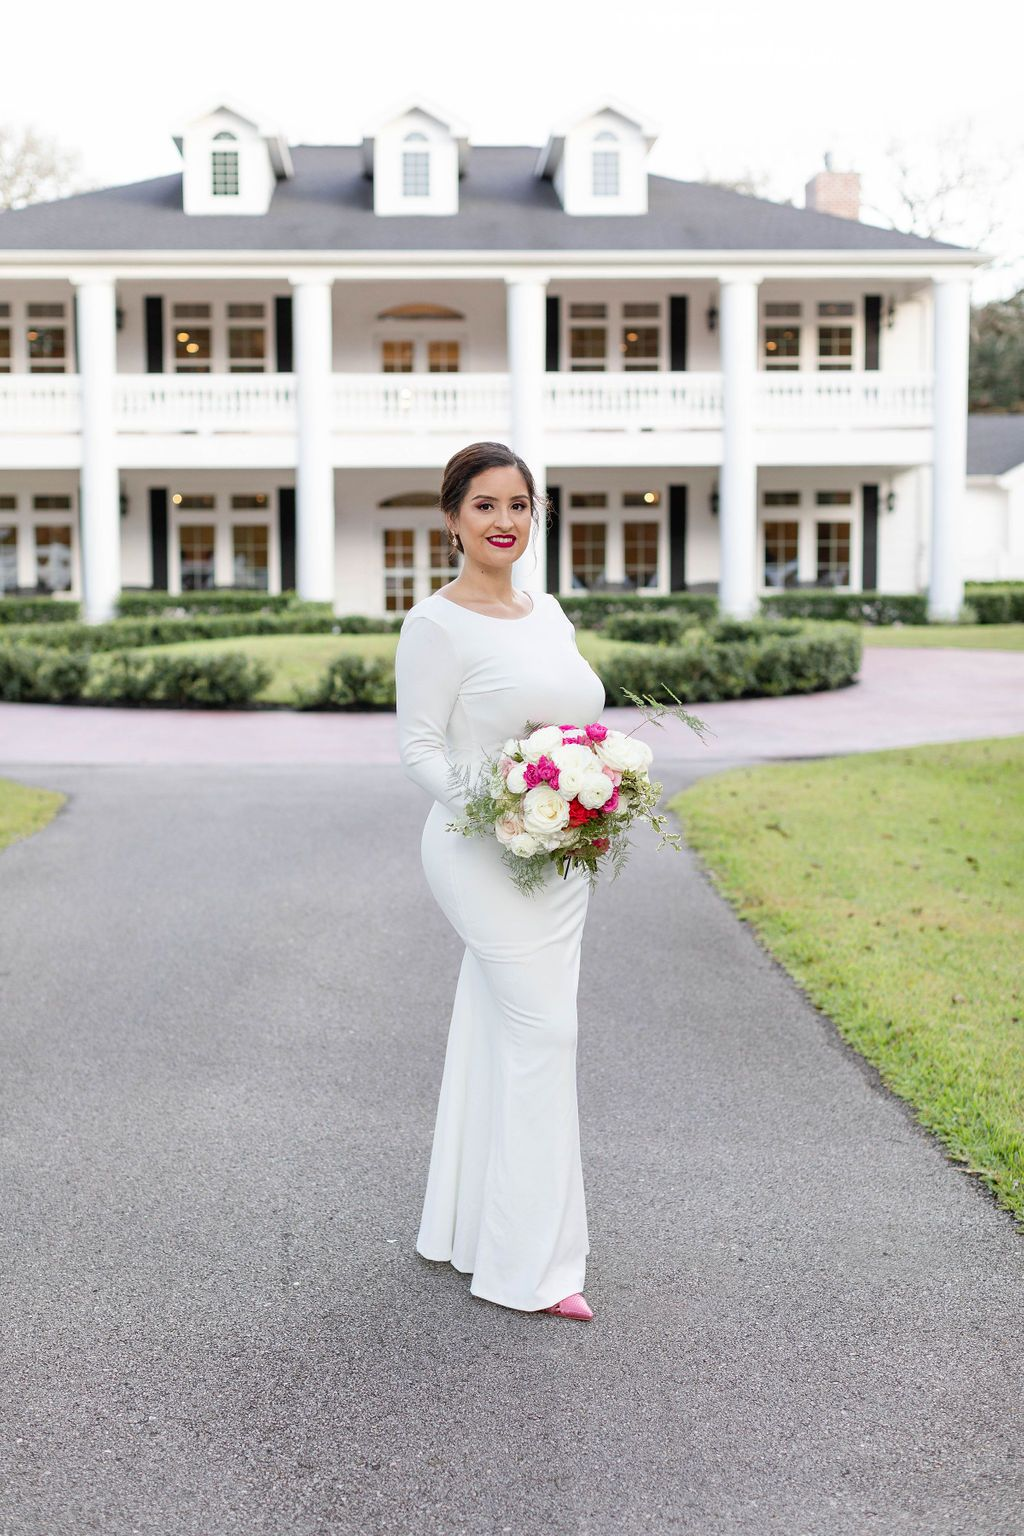 Magnolia Manor Best wedding venues, Luxury wedding